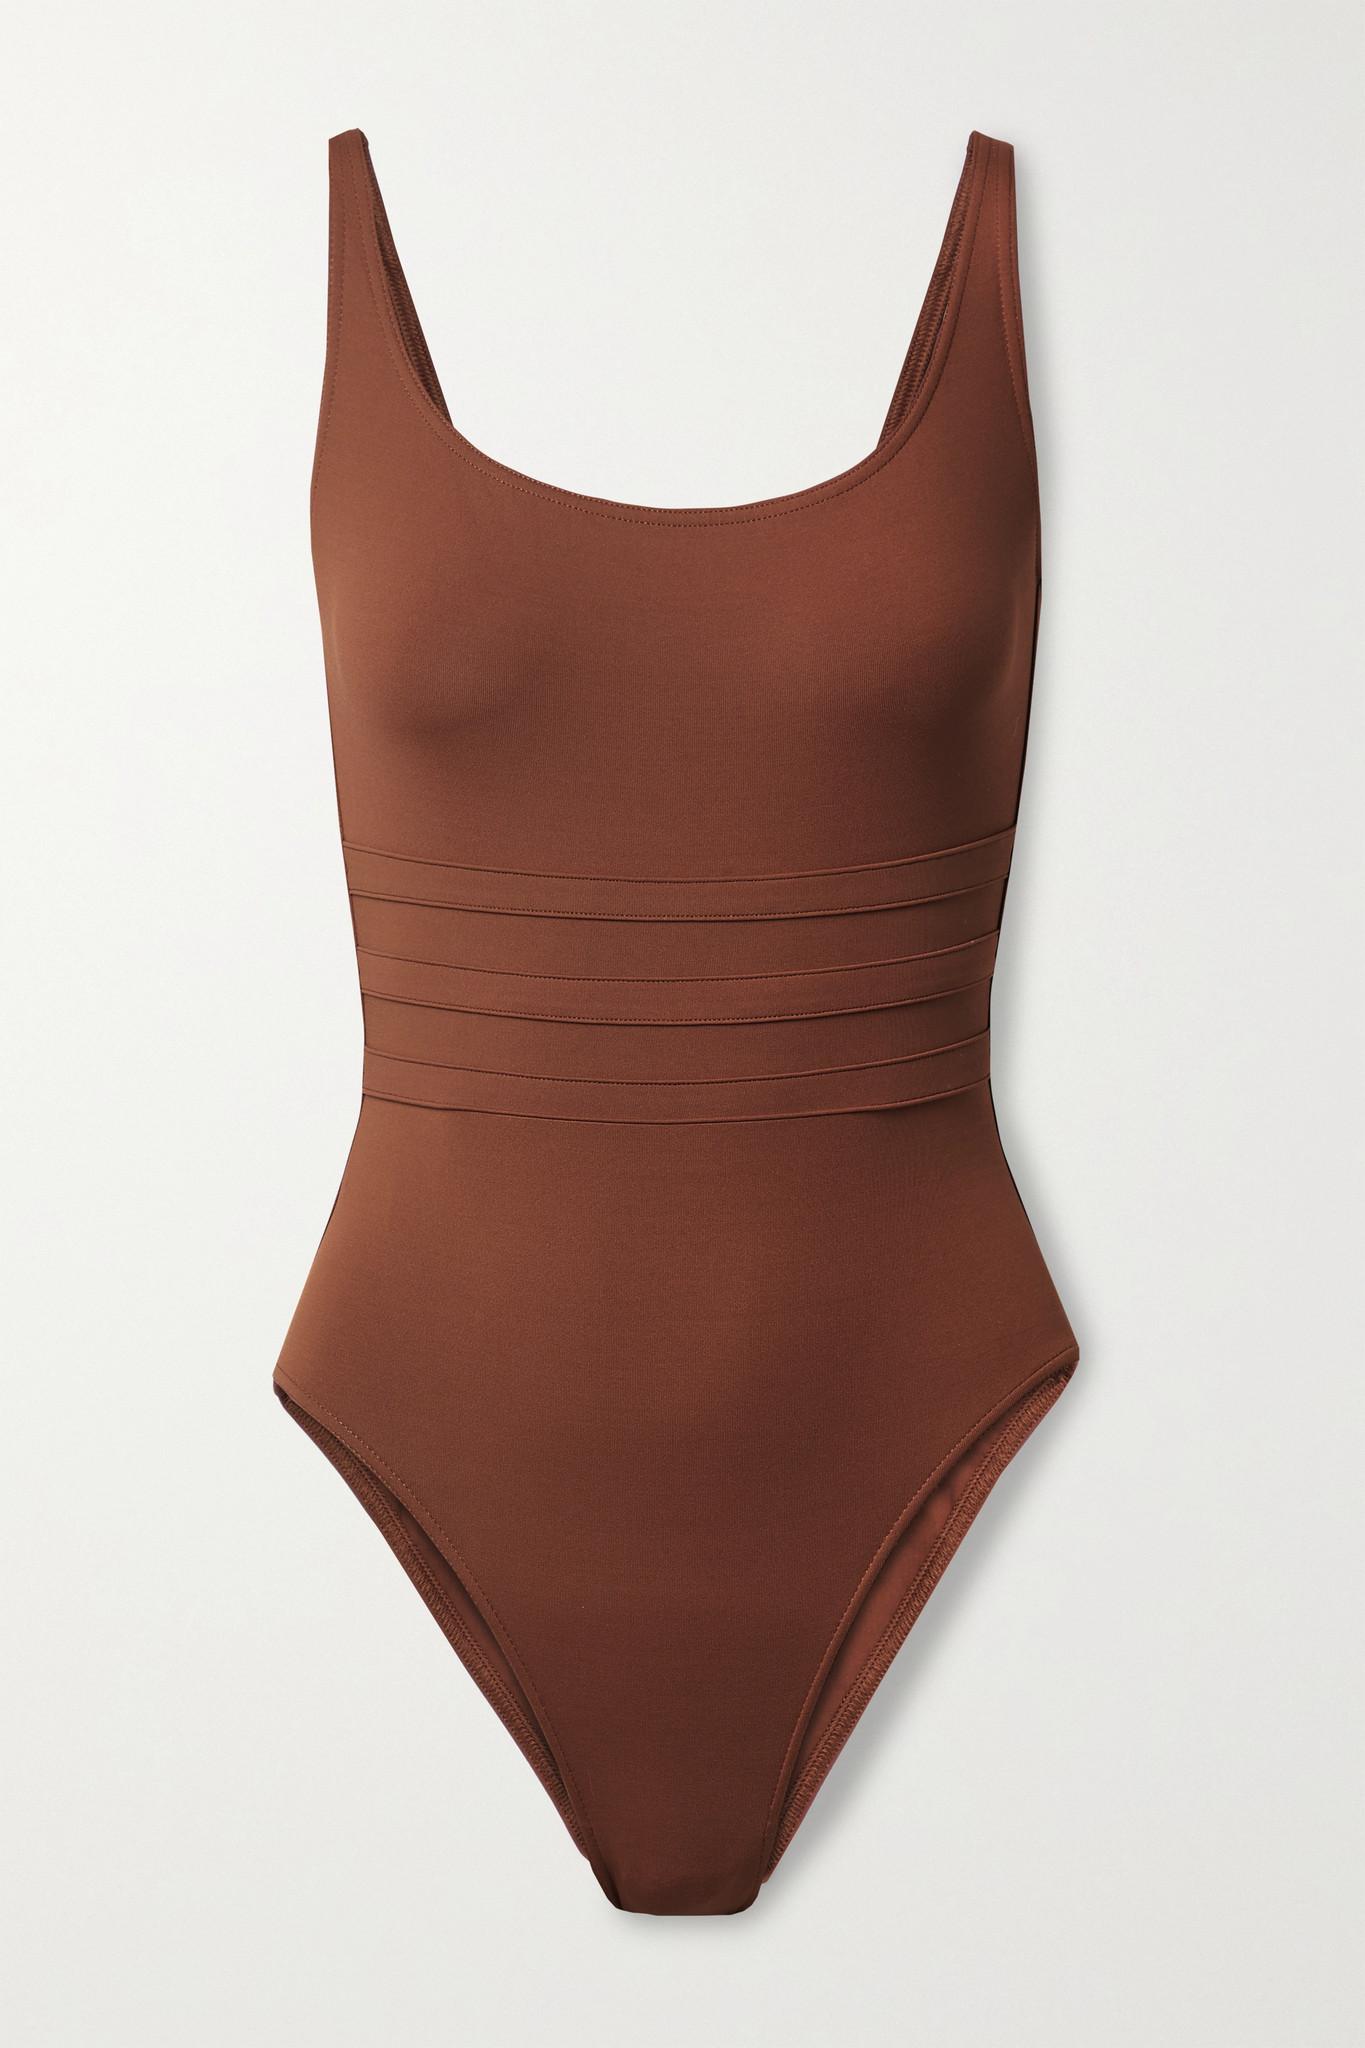 ERES - Les Essentiels Asia Paneled Swimsuit - Brown - FR40